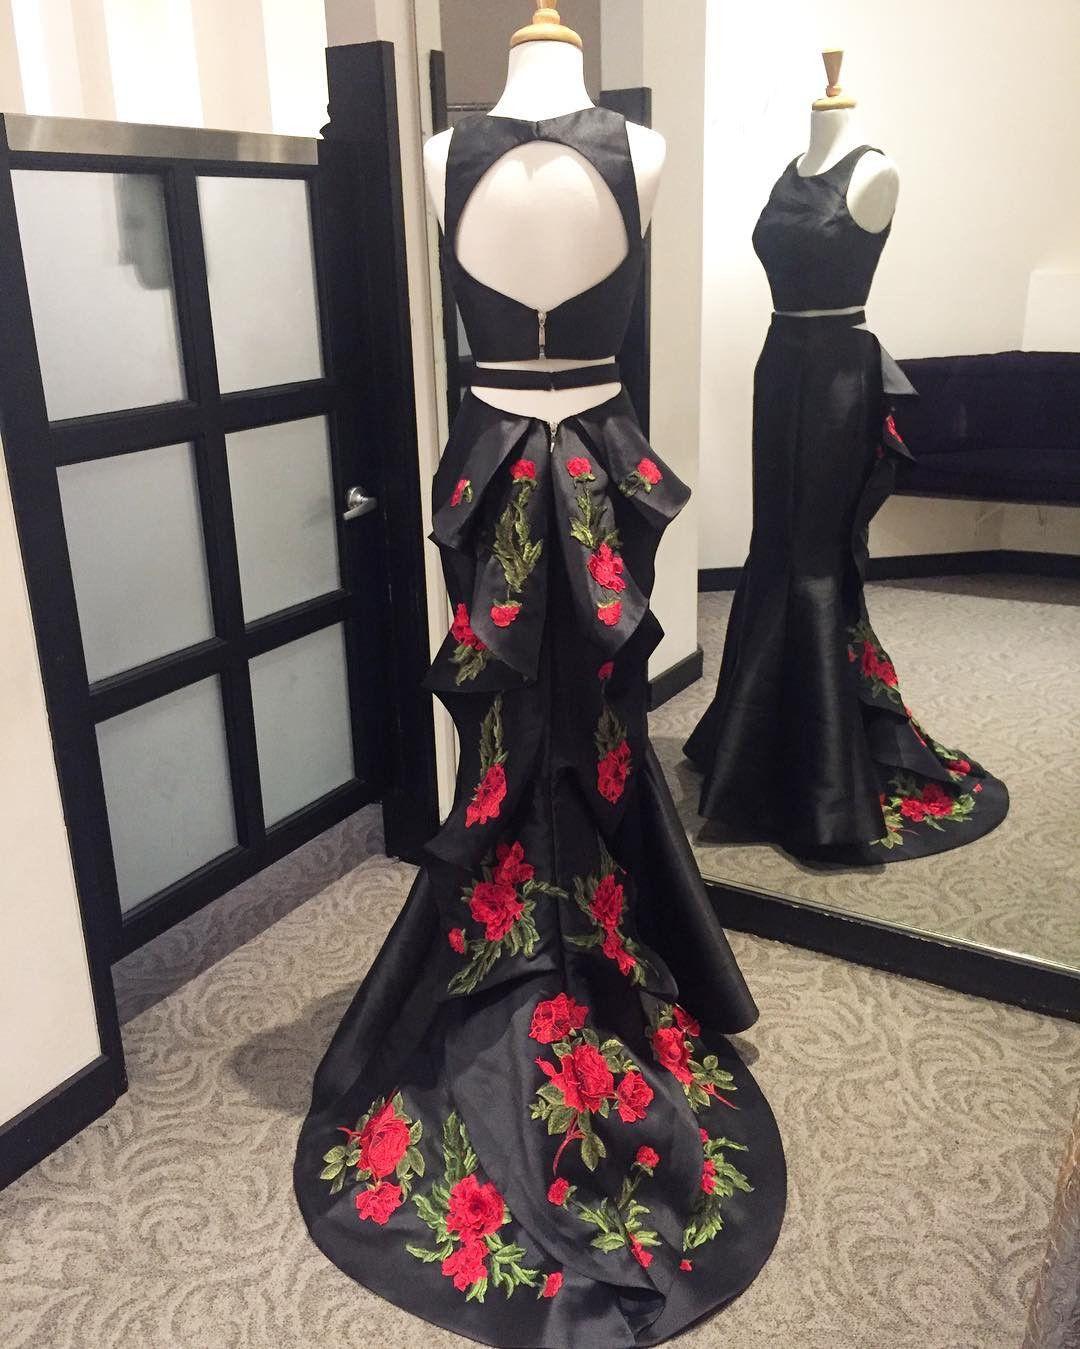 New arrival prom dressmodest prom dressblack evening dressmermaid